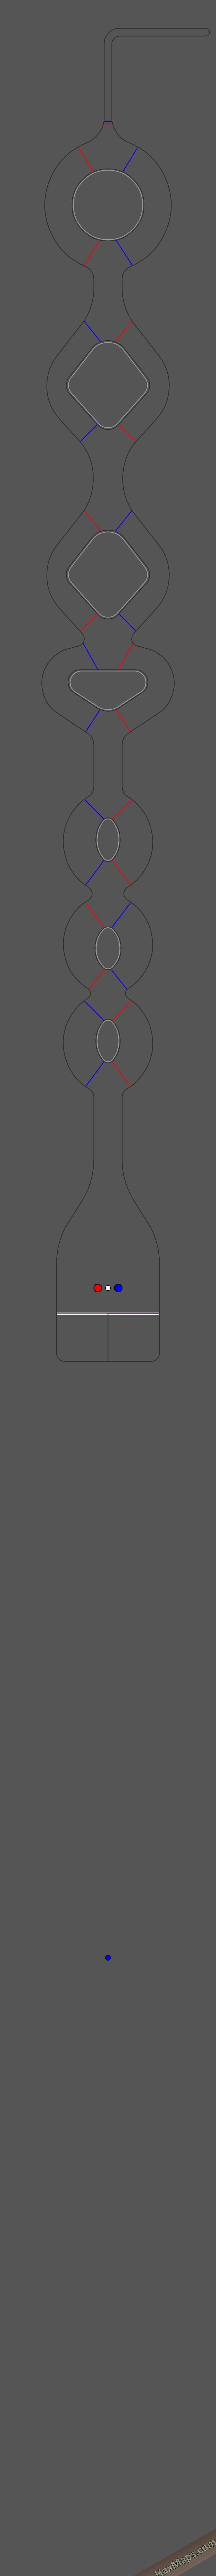 hax ball maps | Collision team racing 3 by MC